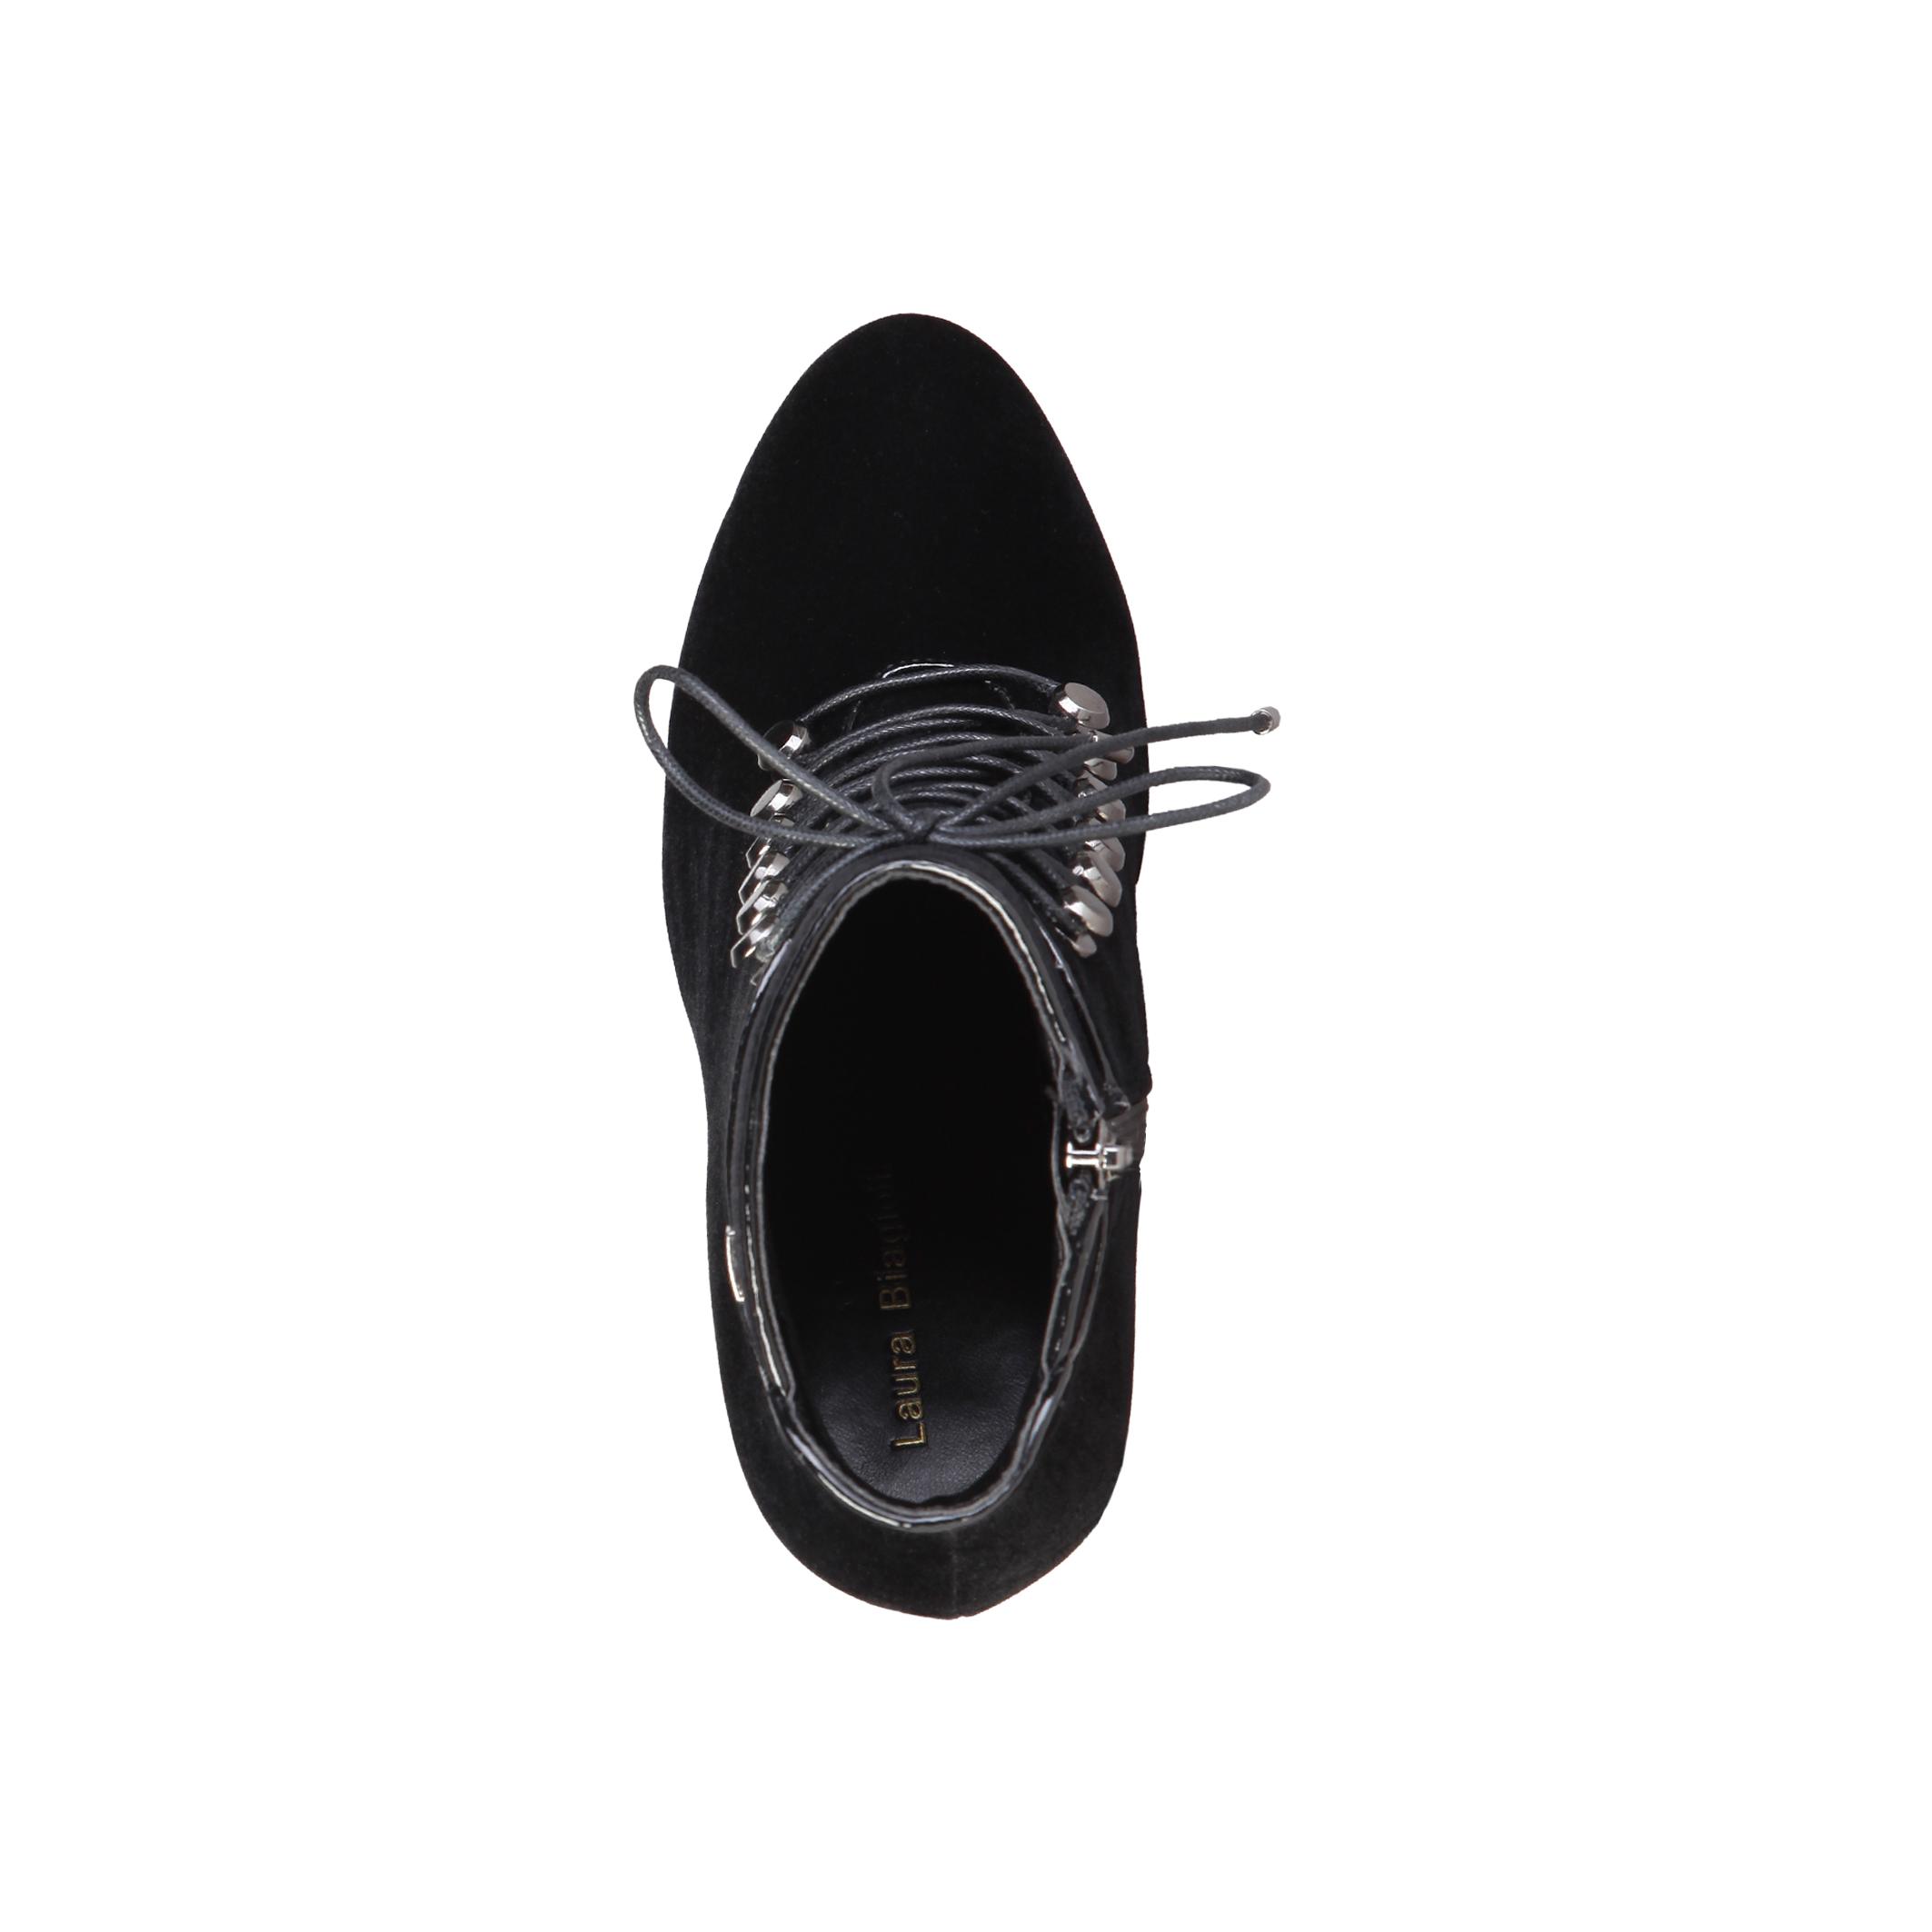 Chaussures de ville  Laura Biagiotti 2103 black